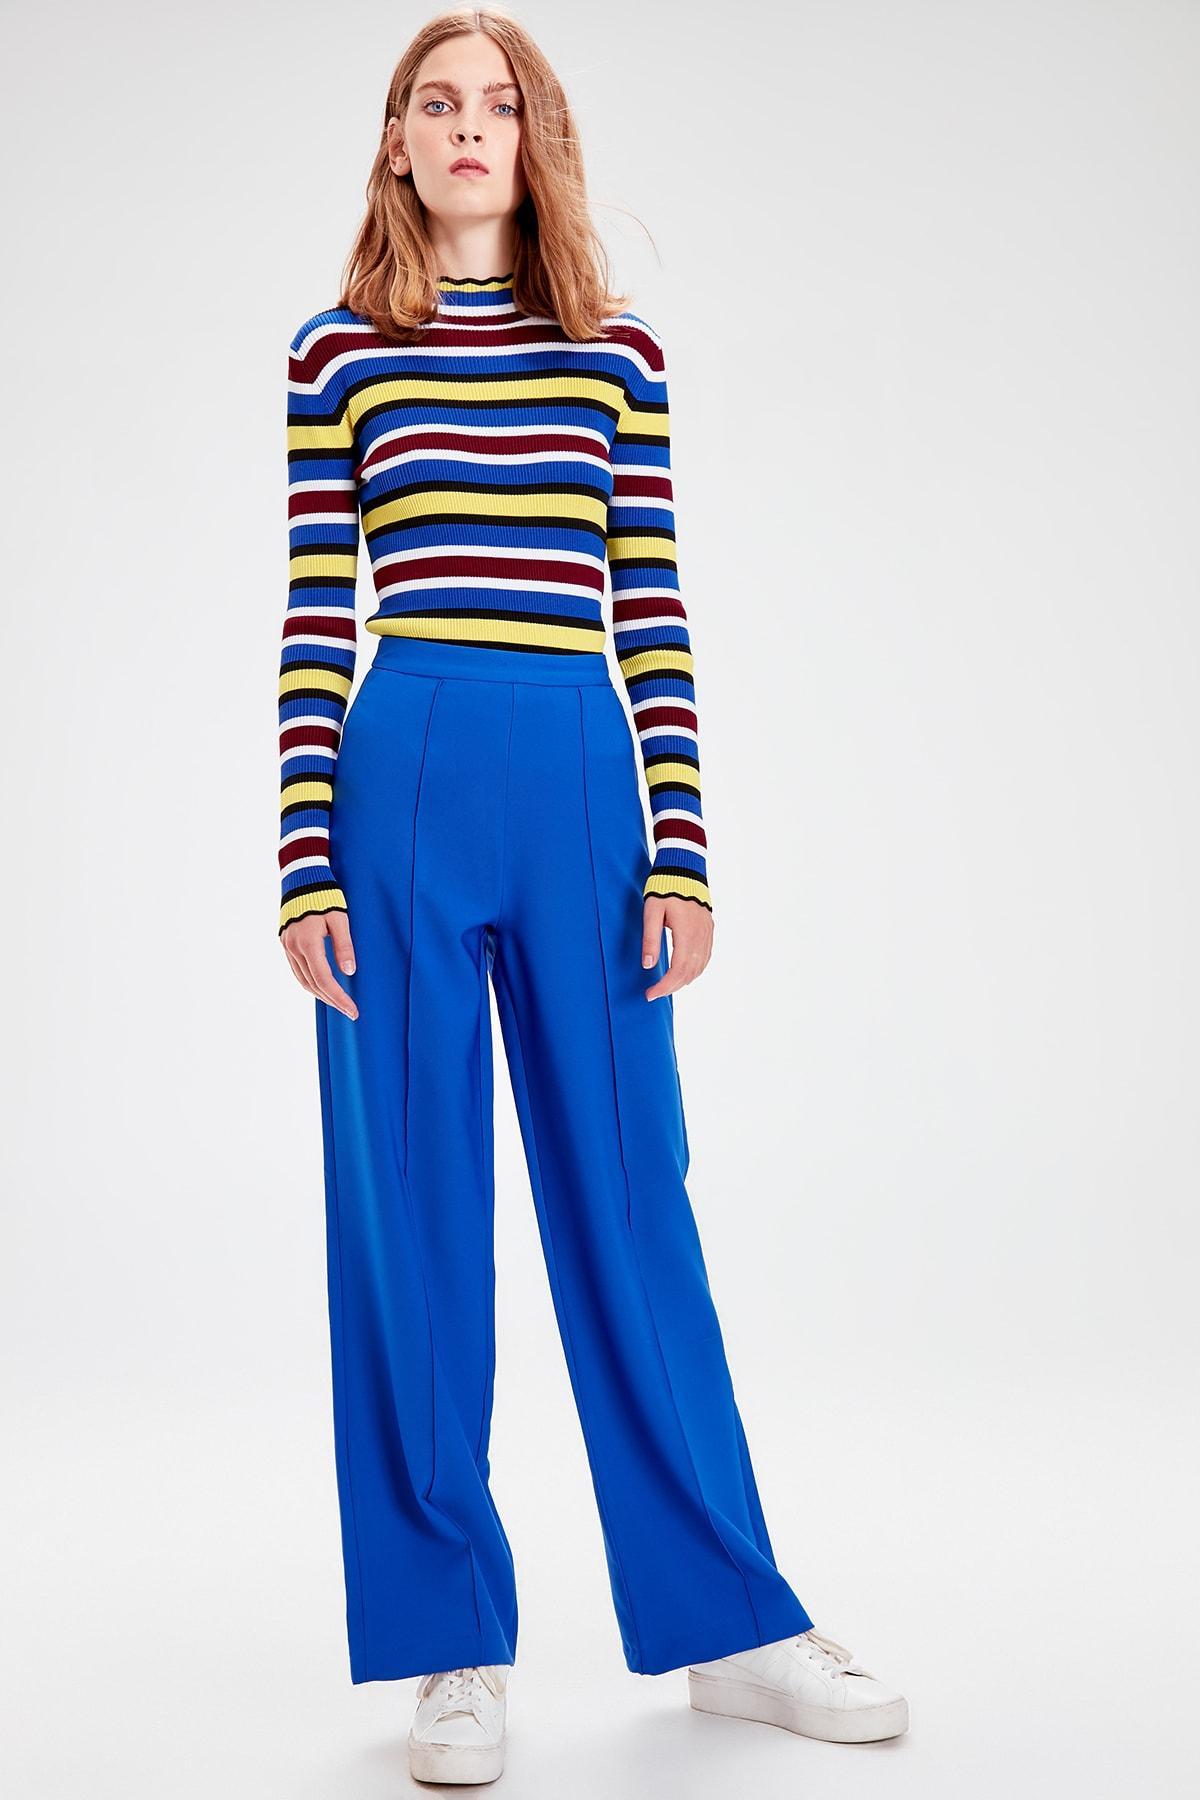 Trendyol Saks Basic Pants TWOAW20PL0194